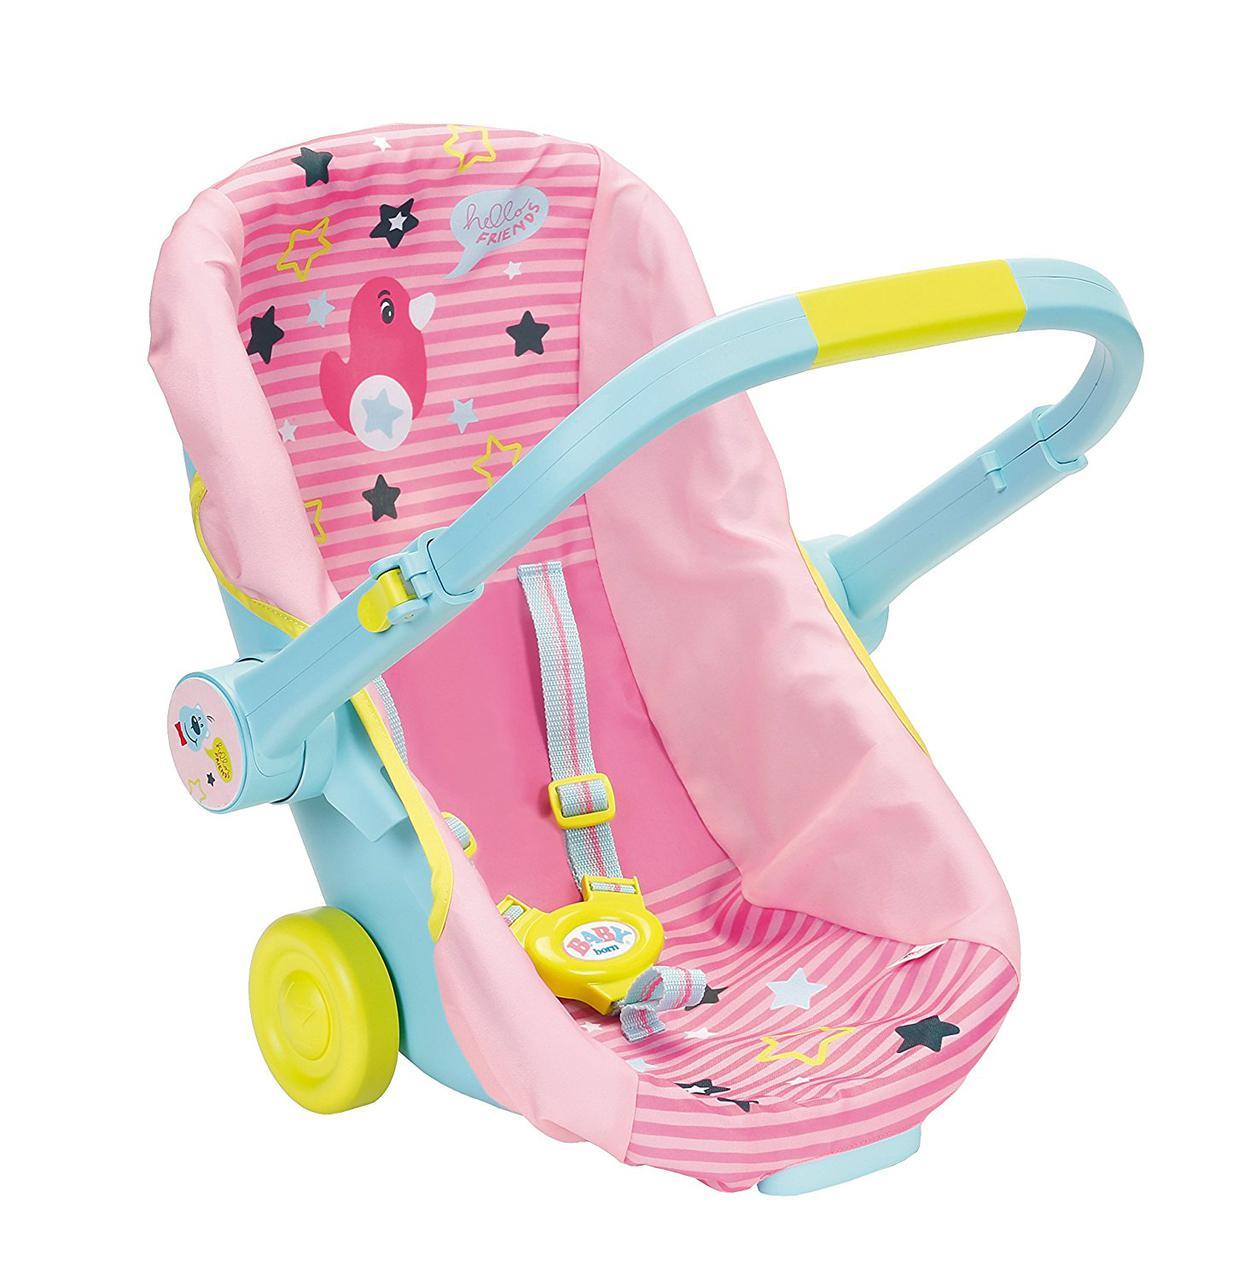 Кресло куклы Беби Борн Baby Born люлька переноска  3 в 1 Zapf Creation 824412